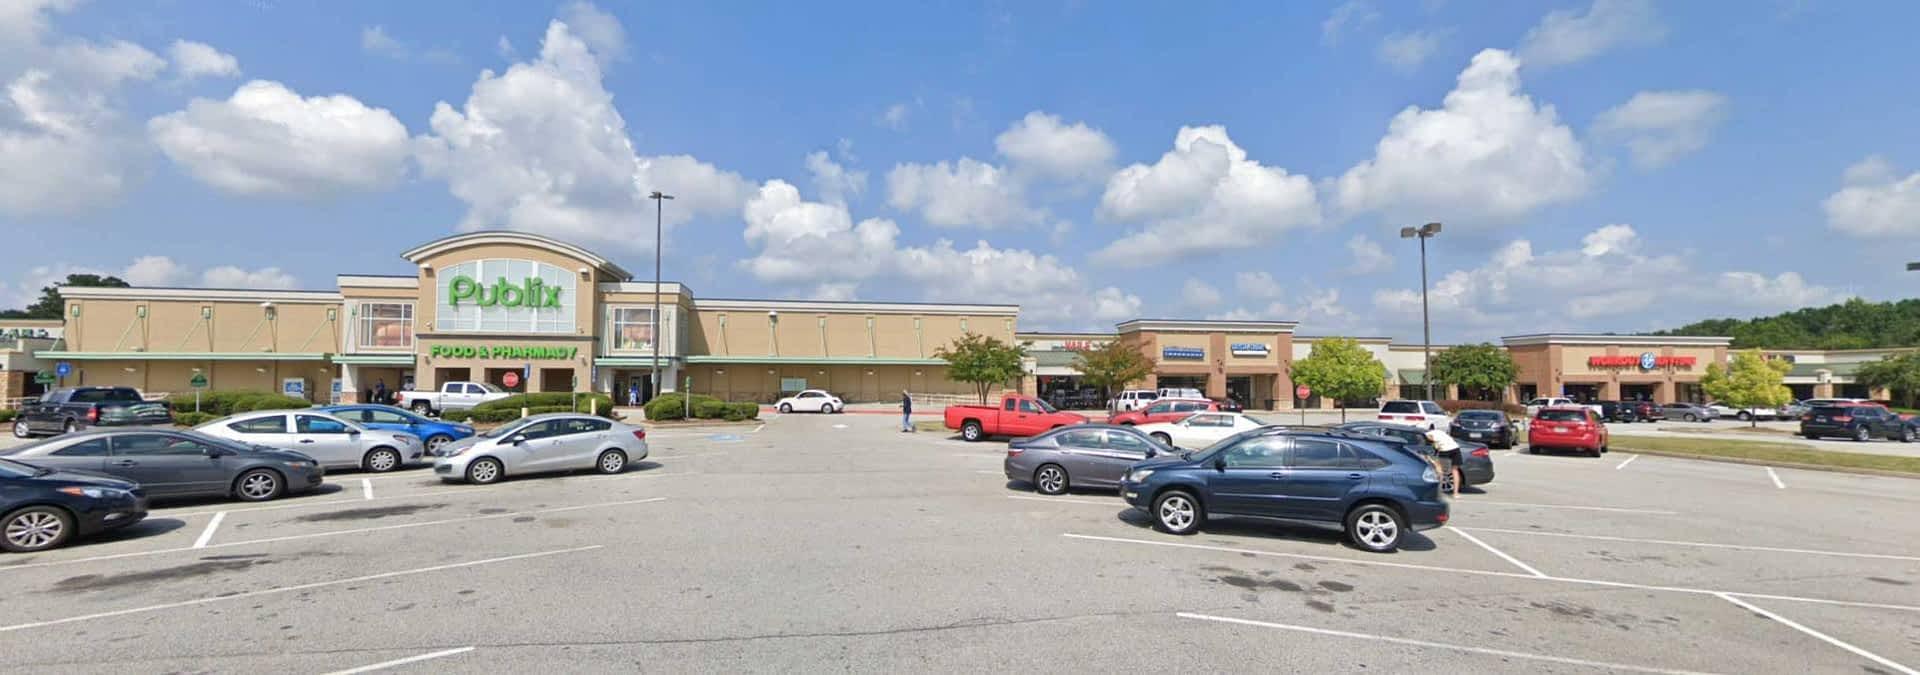 The Shoppes at Locust Grove - retail sale - 2642 Highway 155, Locust Grove, GA